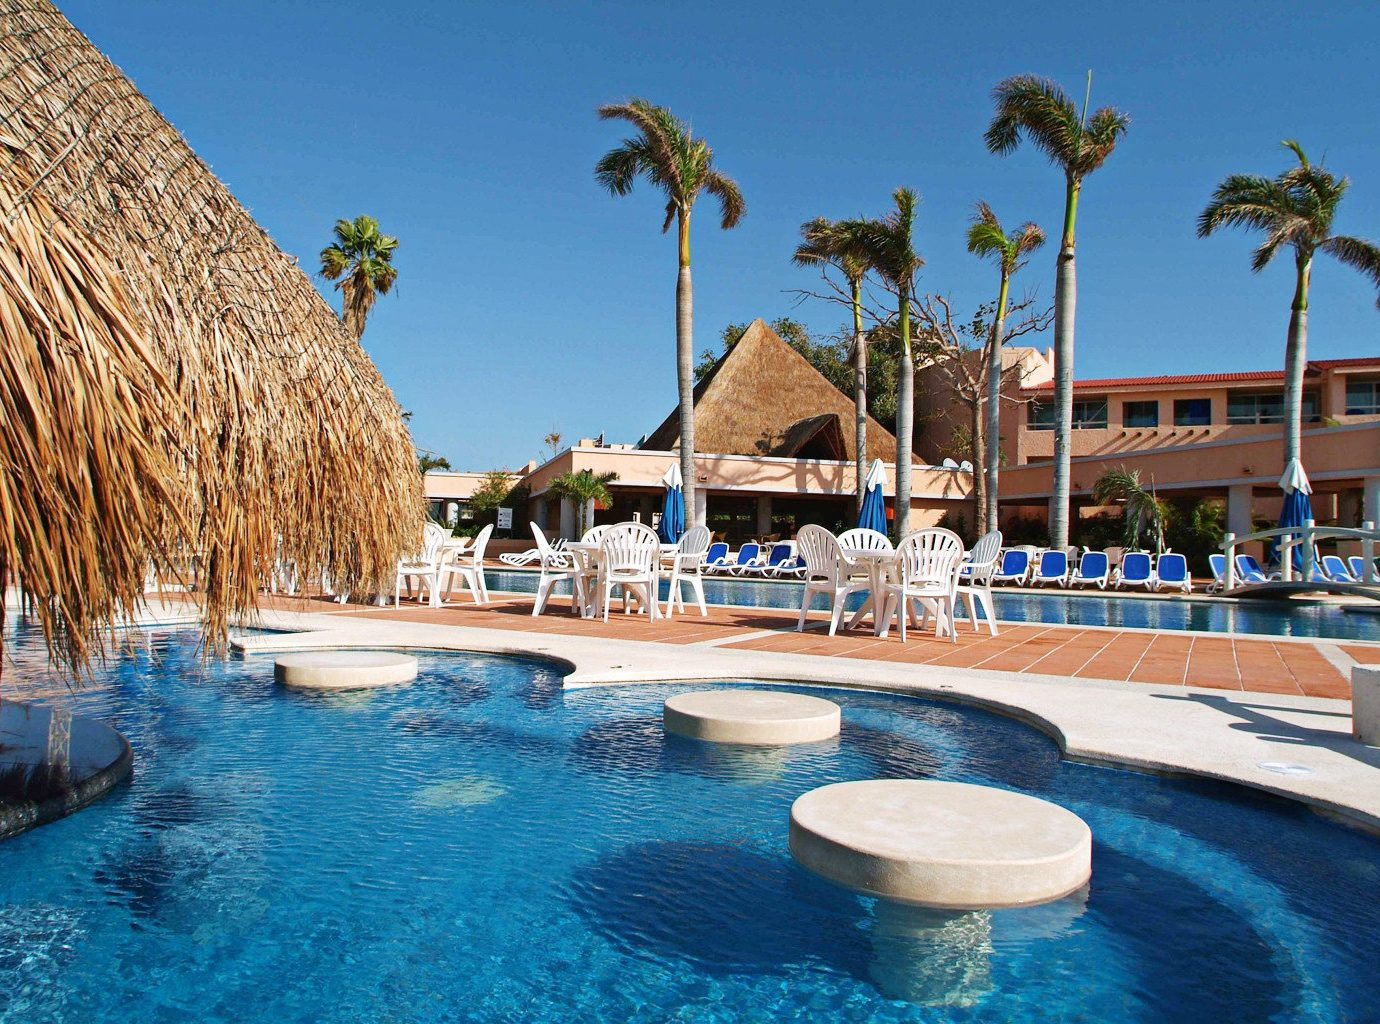 Pool Resort sky water swimming pool leisure chair swimming Water park resort town Island